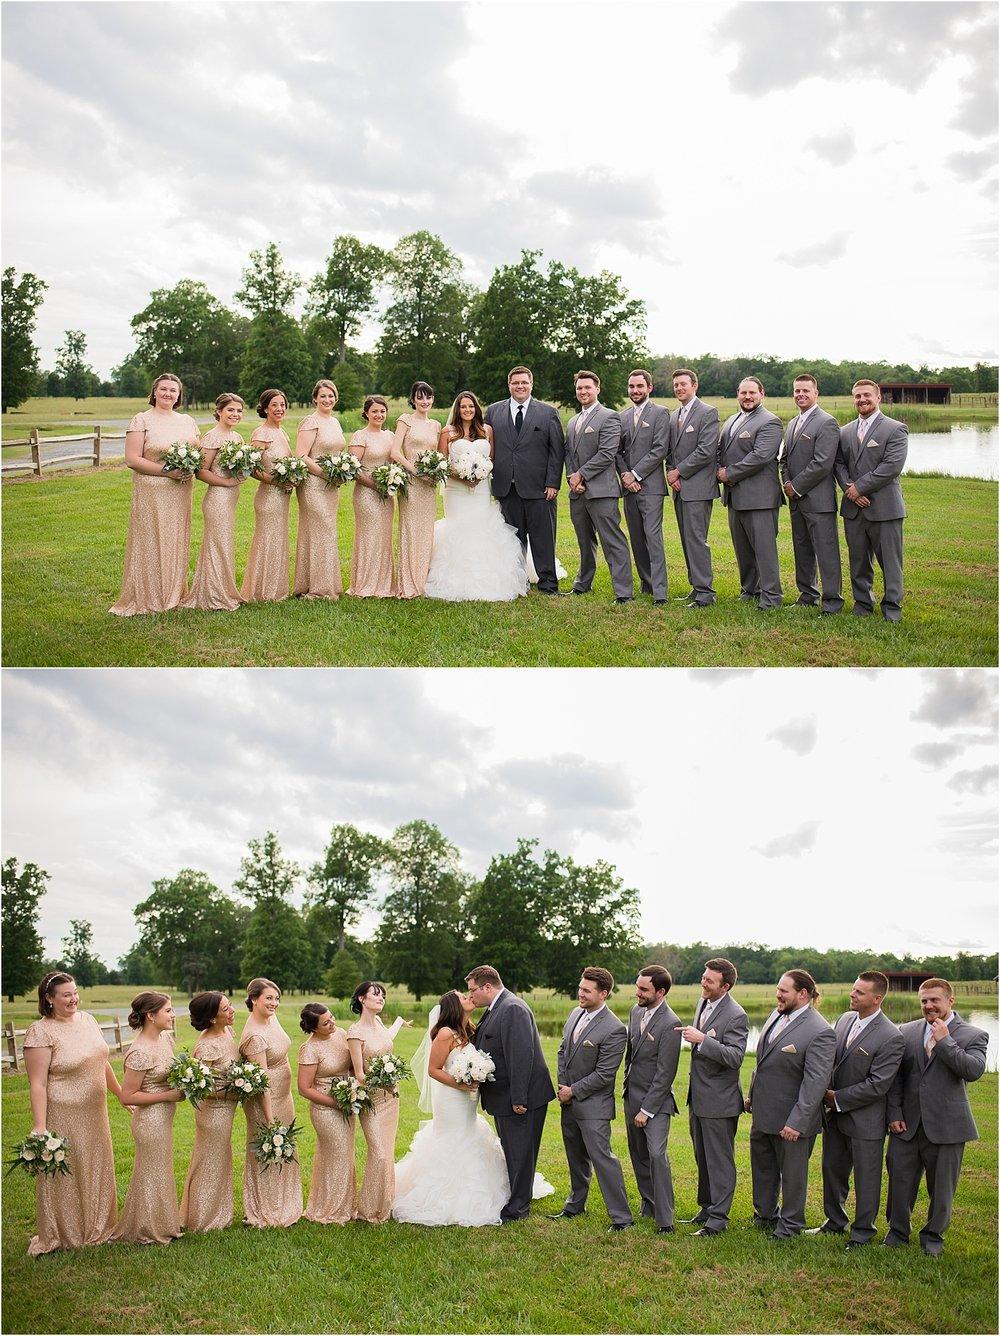 Charlotte-Spring-Rustic-Wedding-Concord-North-Carolina-Farm-At-Busharbor